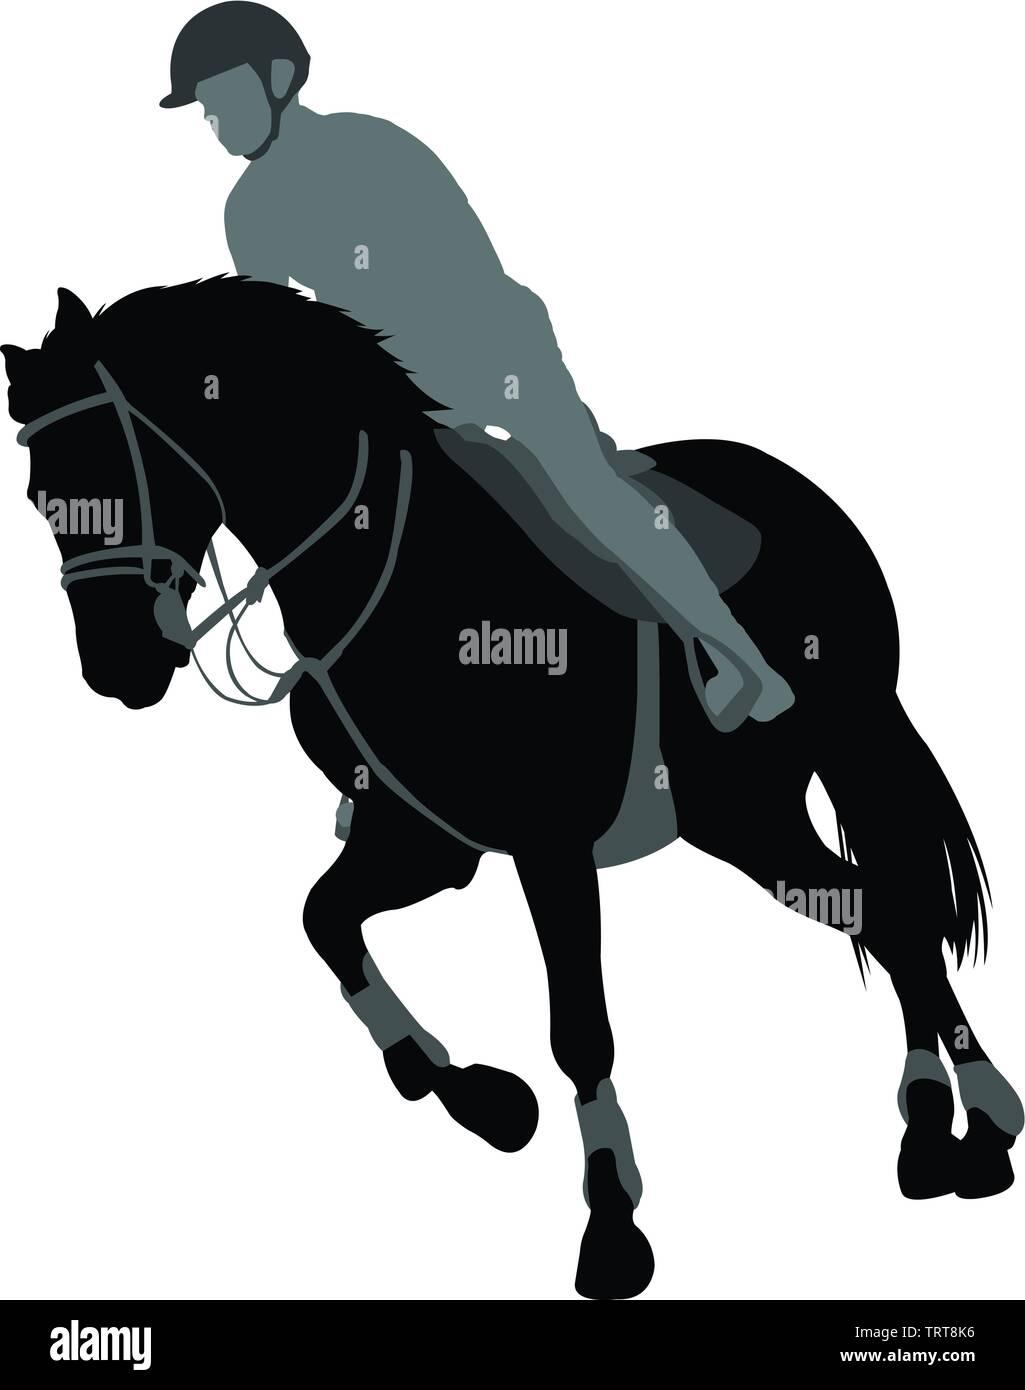 horse riding,equestrian sport silhouette - vector Stock Vector